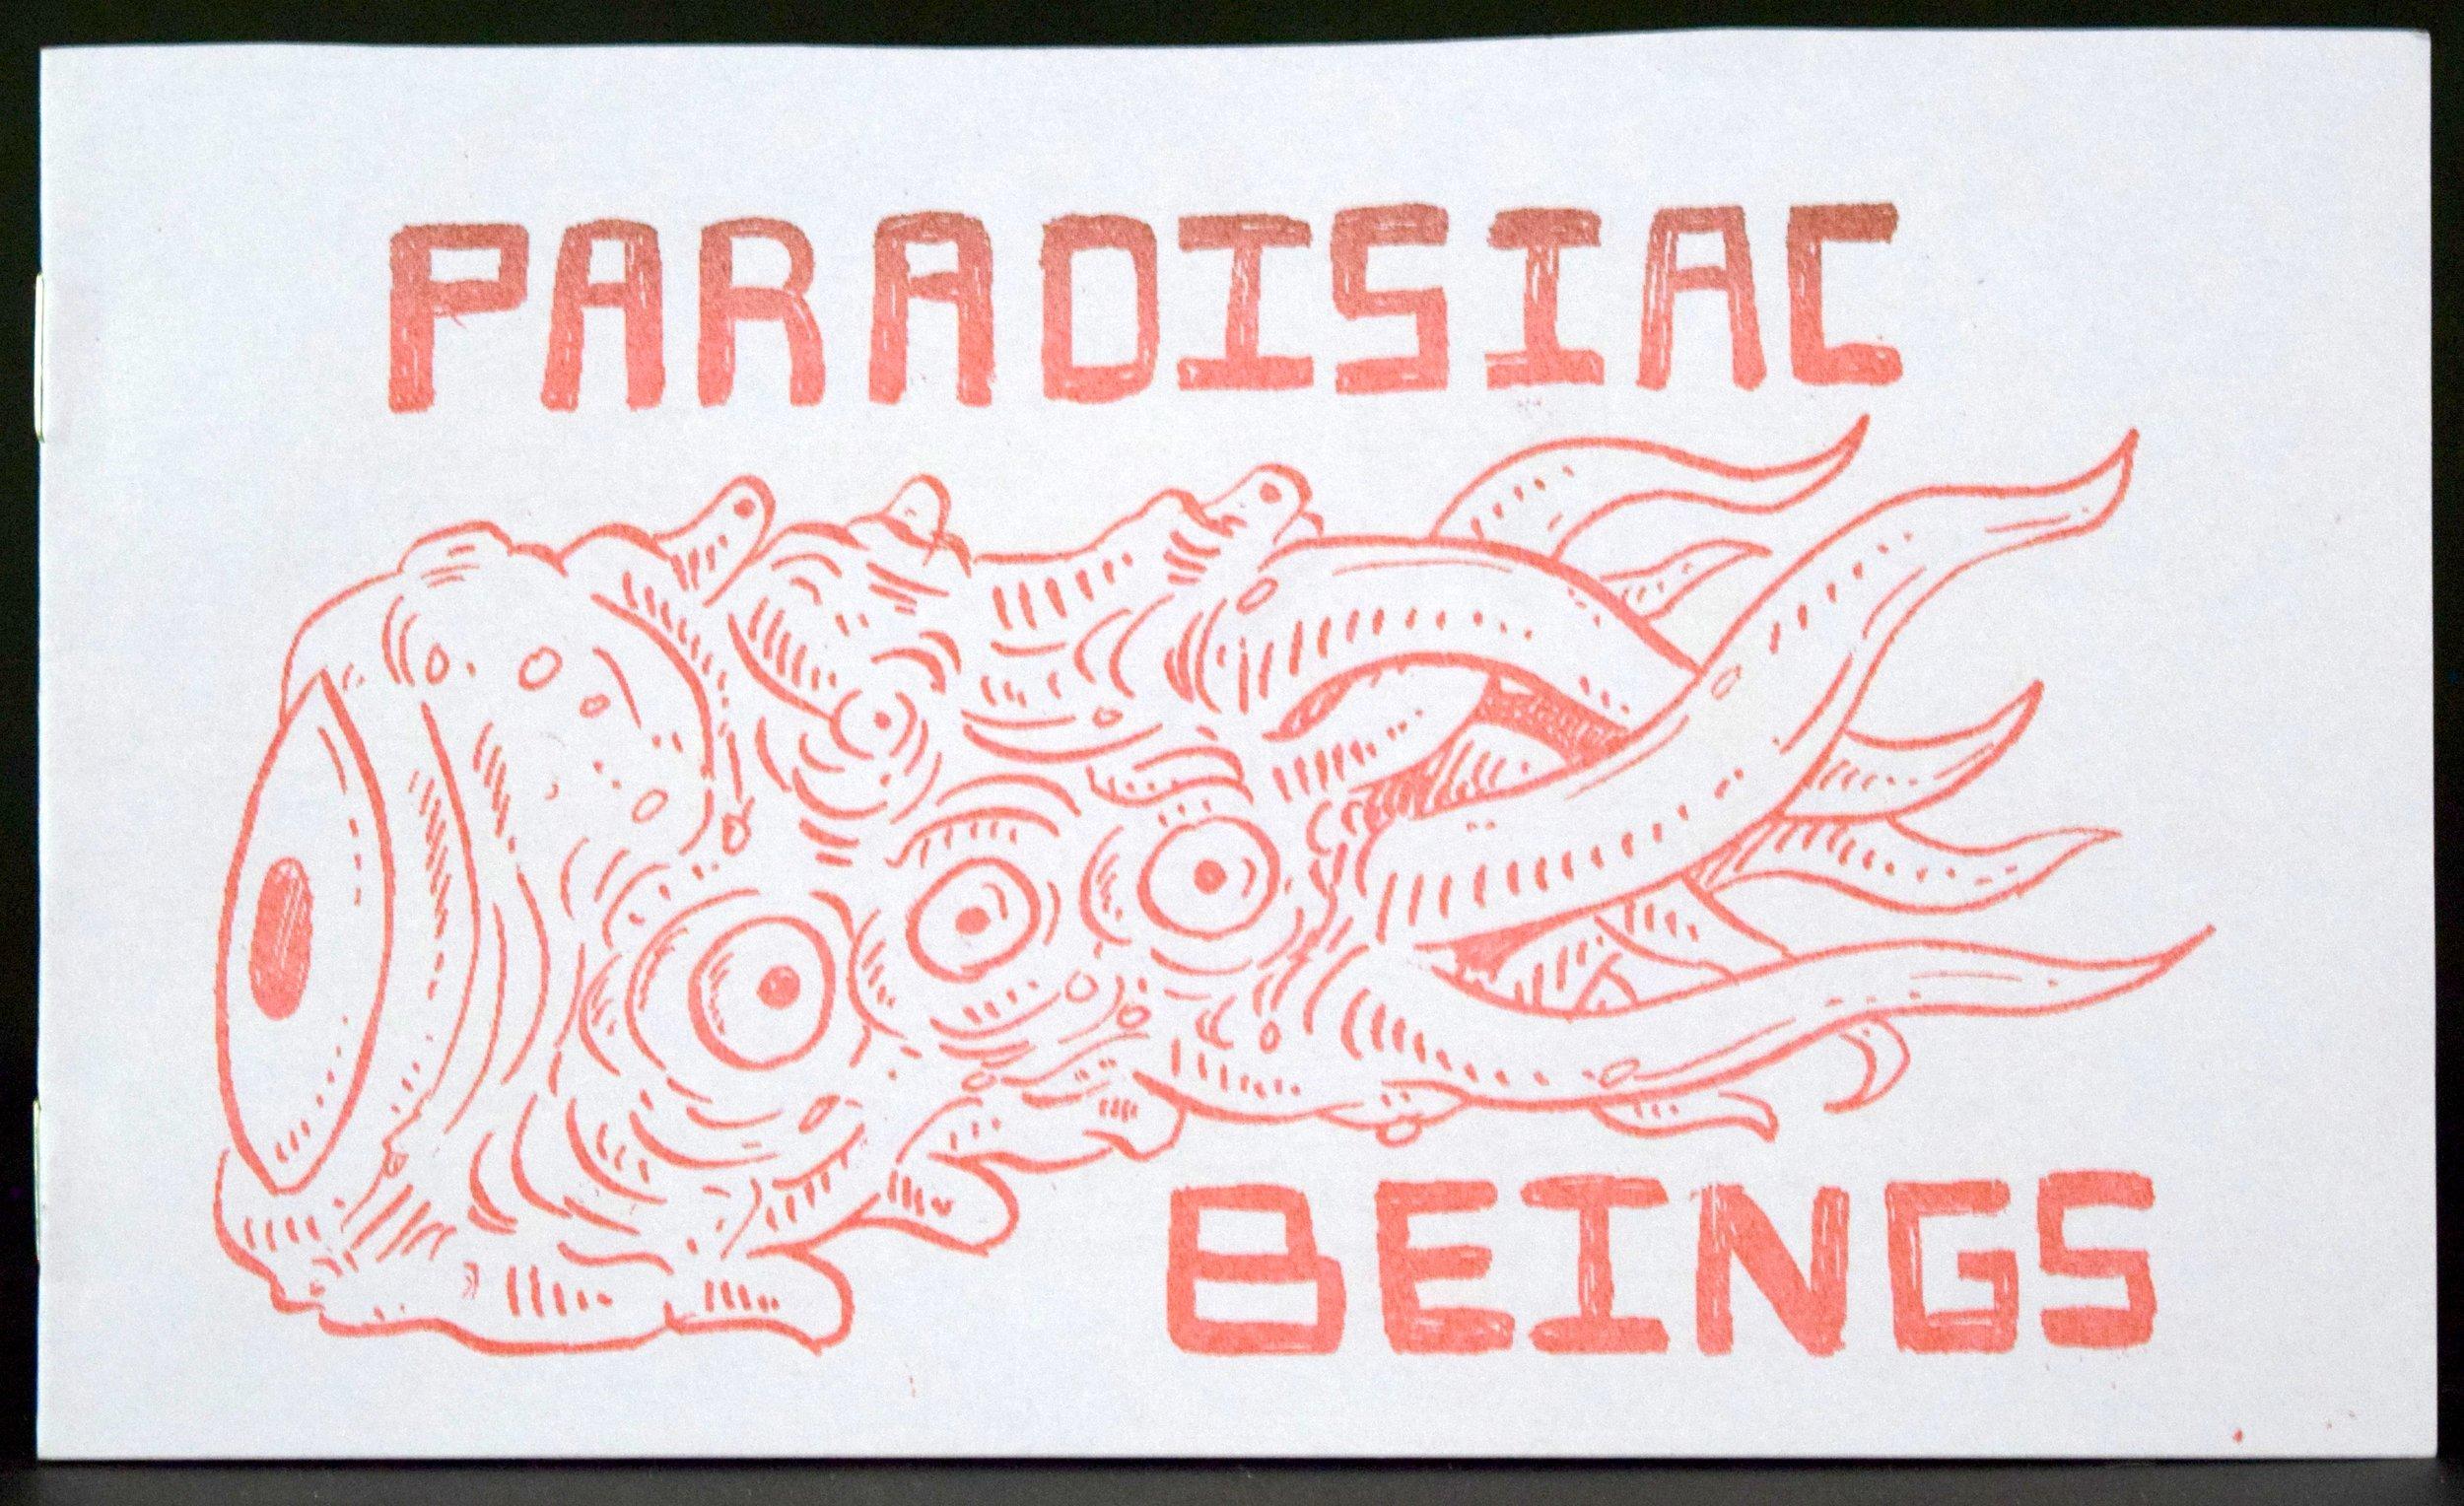 Paradisiac Beings by  Adam Yeater .